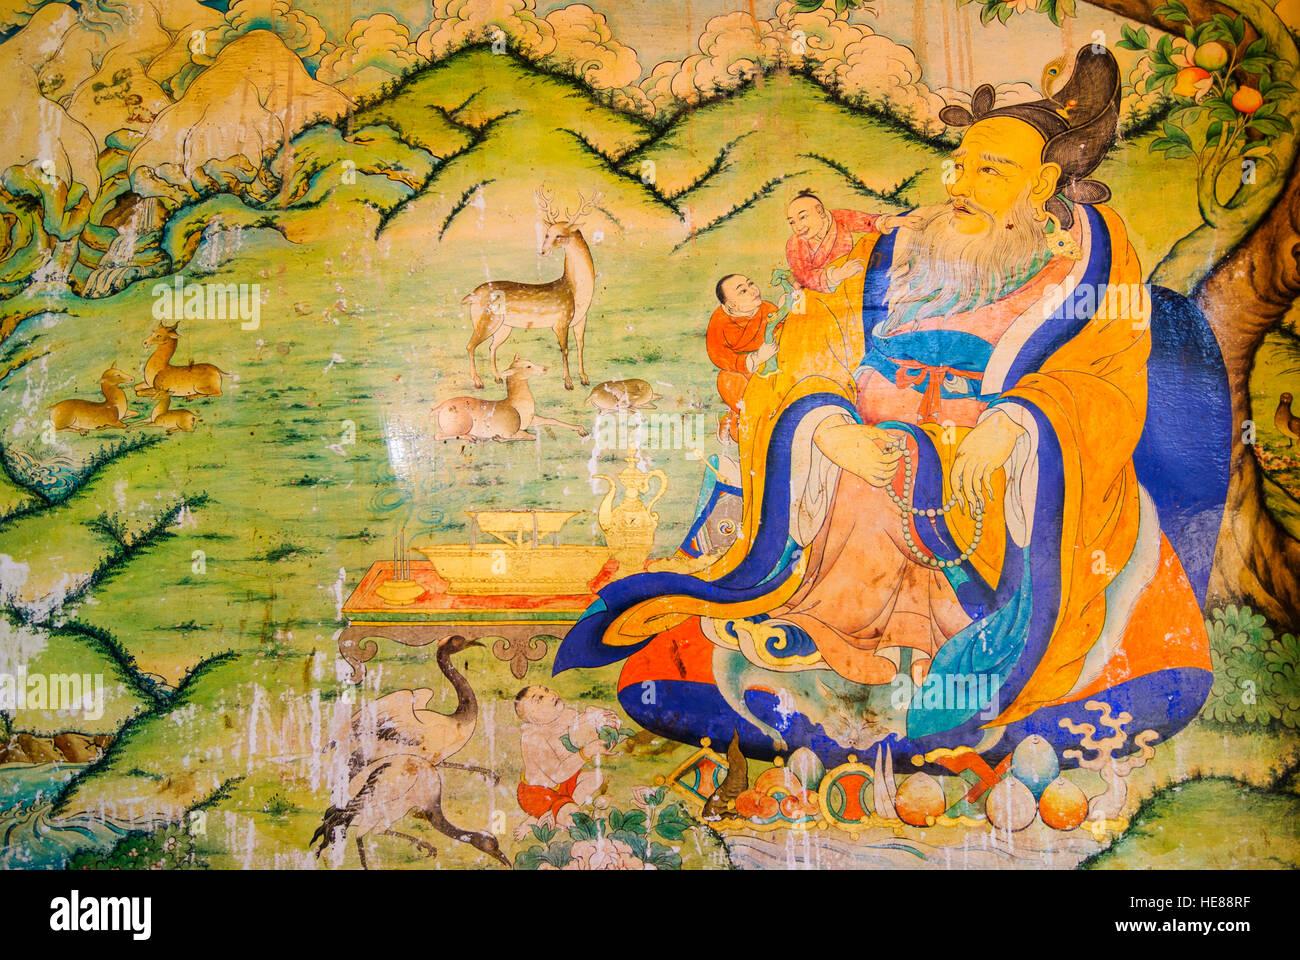 Wall Painting Monastery Tibet Stock Photos & Wall Painting Monastery ...